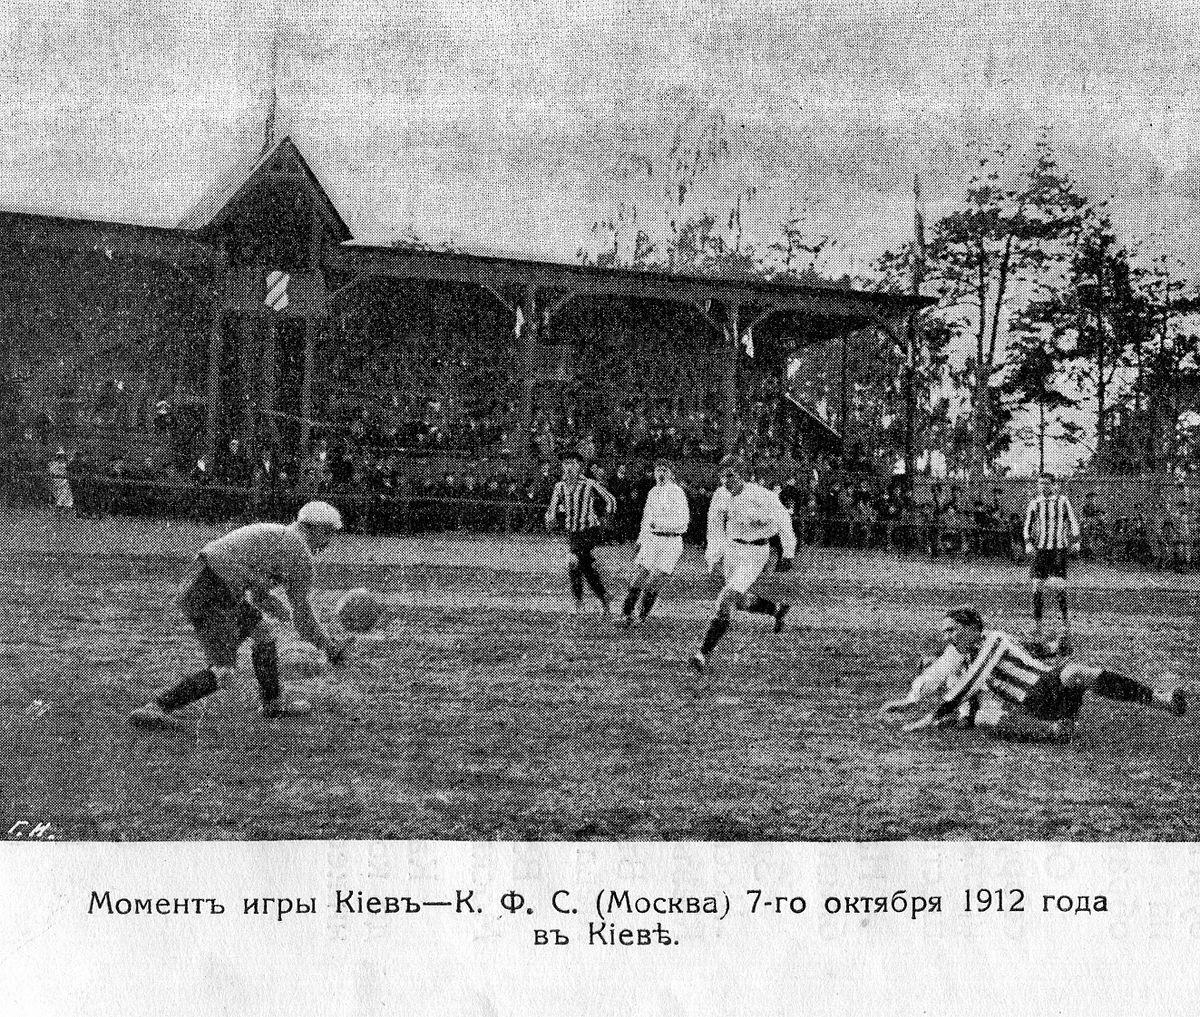 1912 клуб москва клуб яхт клуб вакансии москва